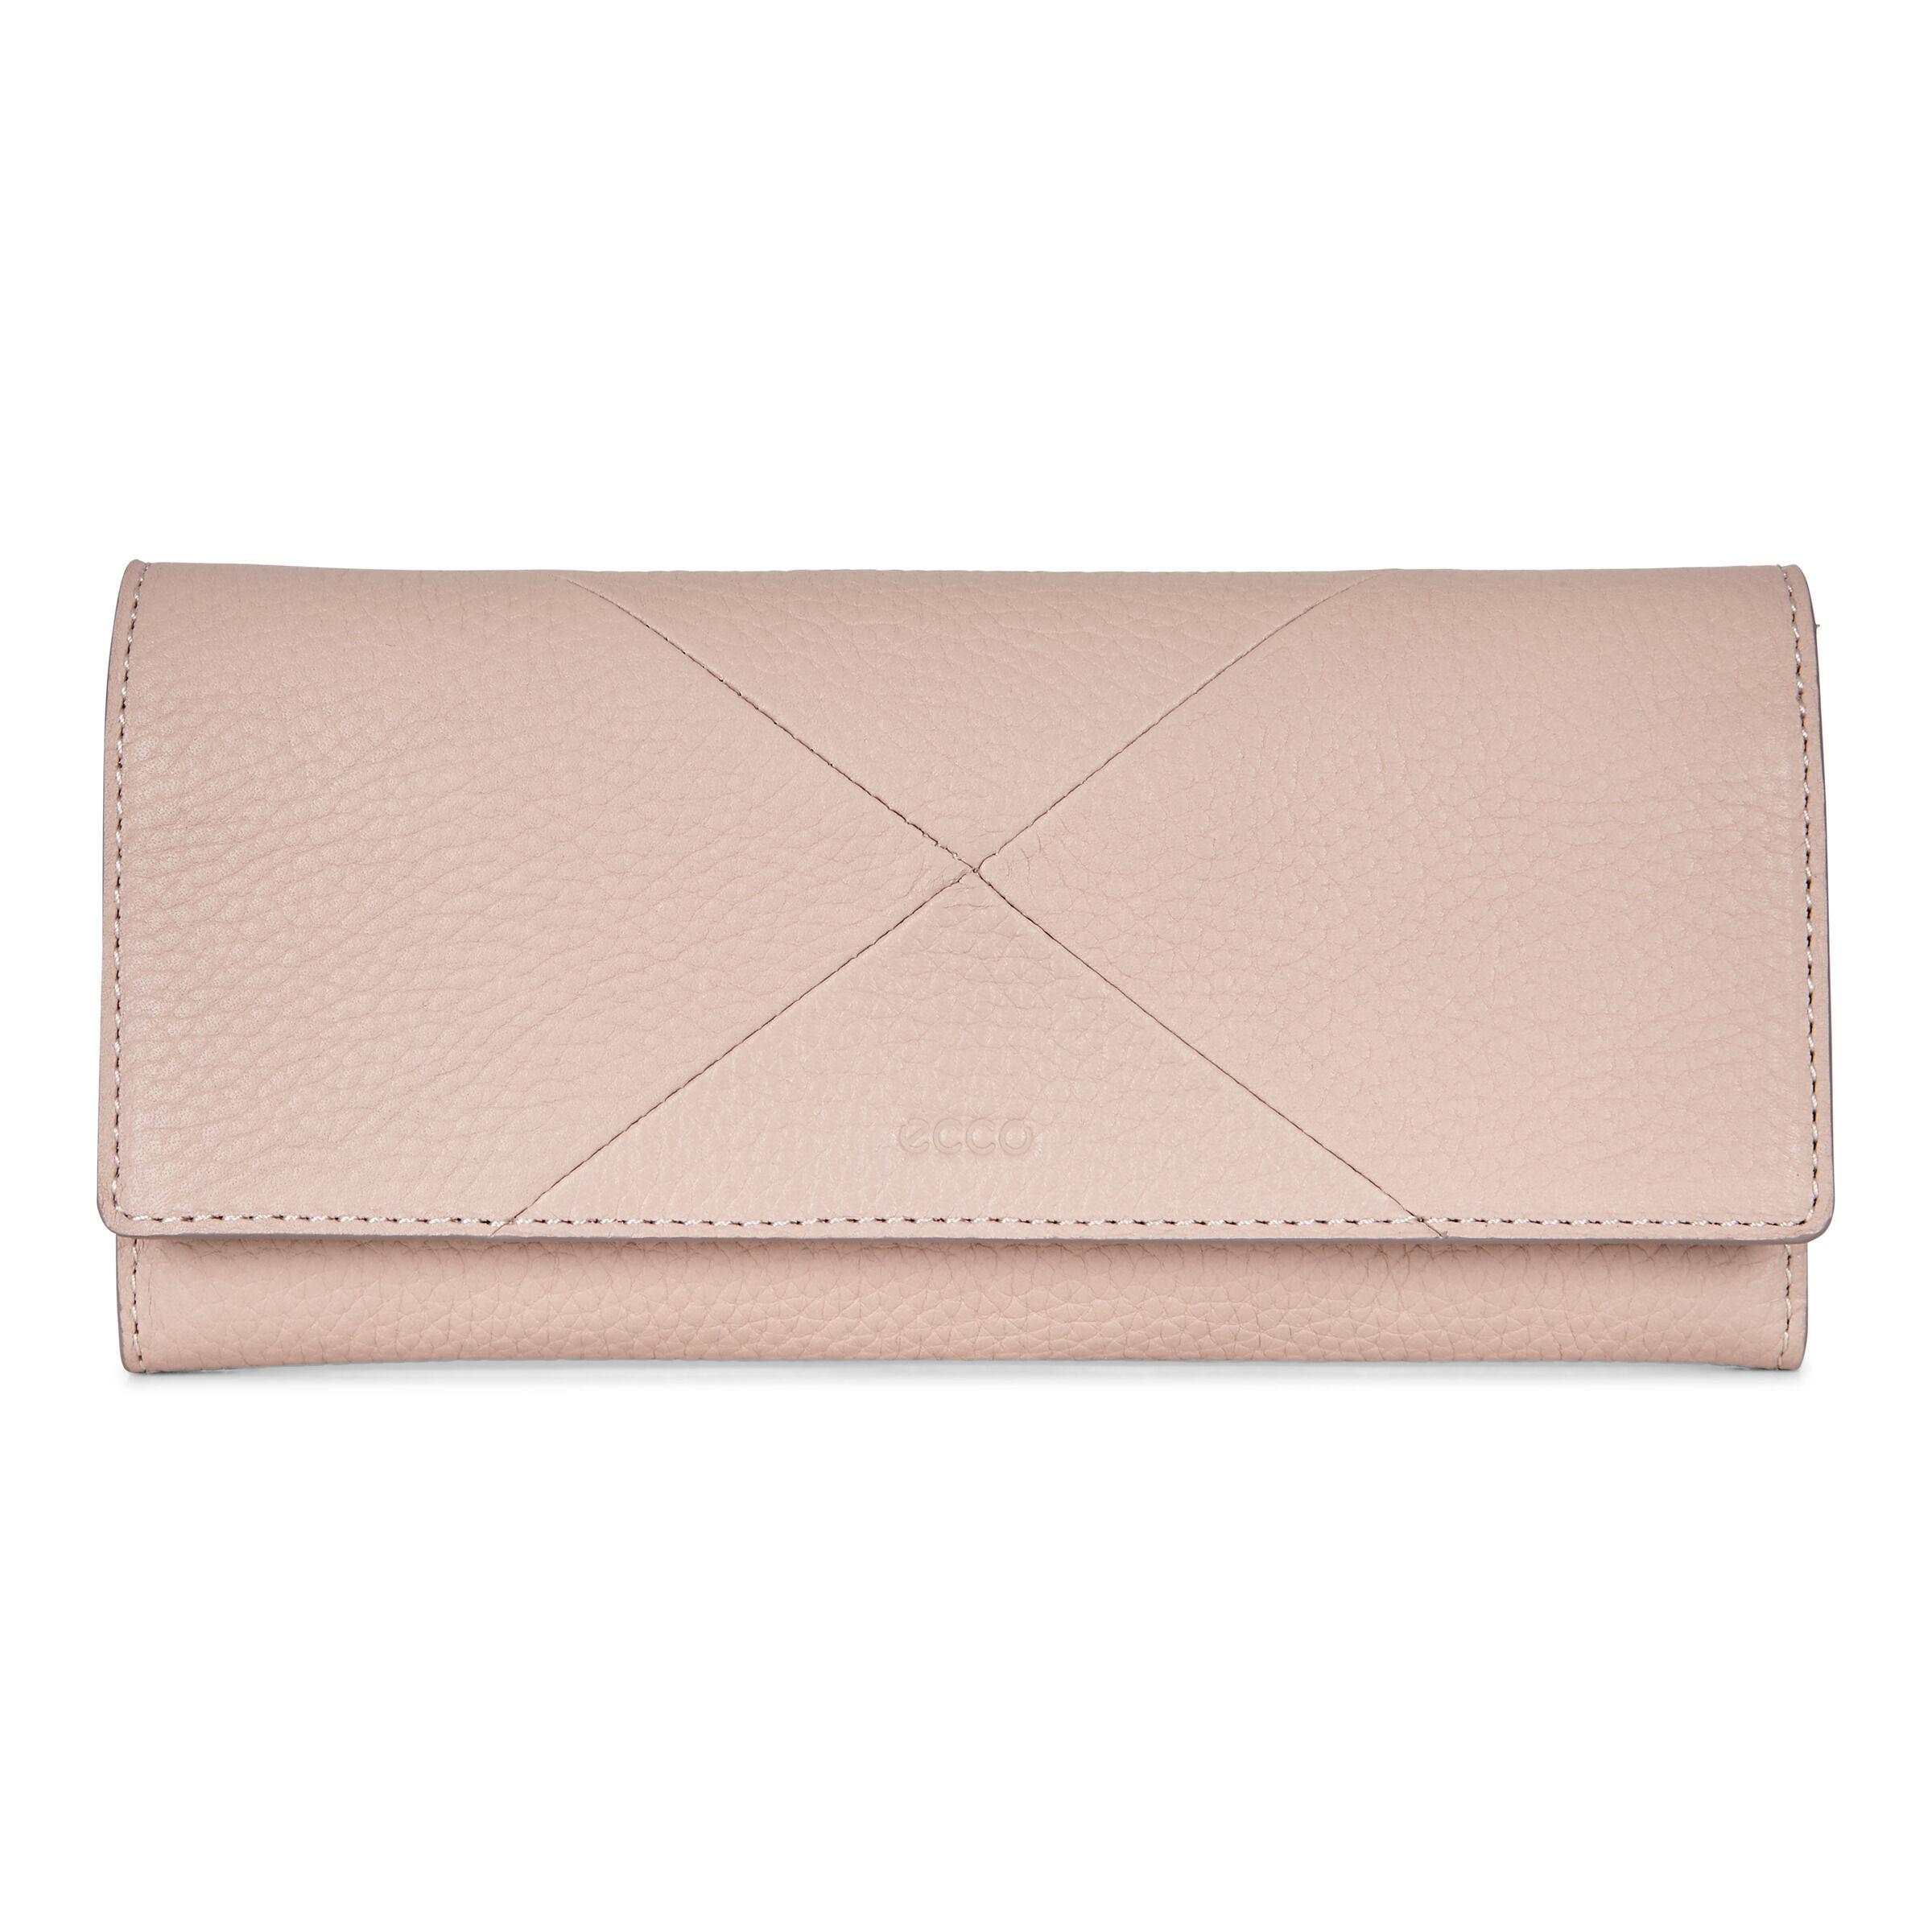 ECCO Linnea Continental Wallet: One Size - Rose Dust